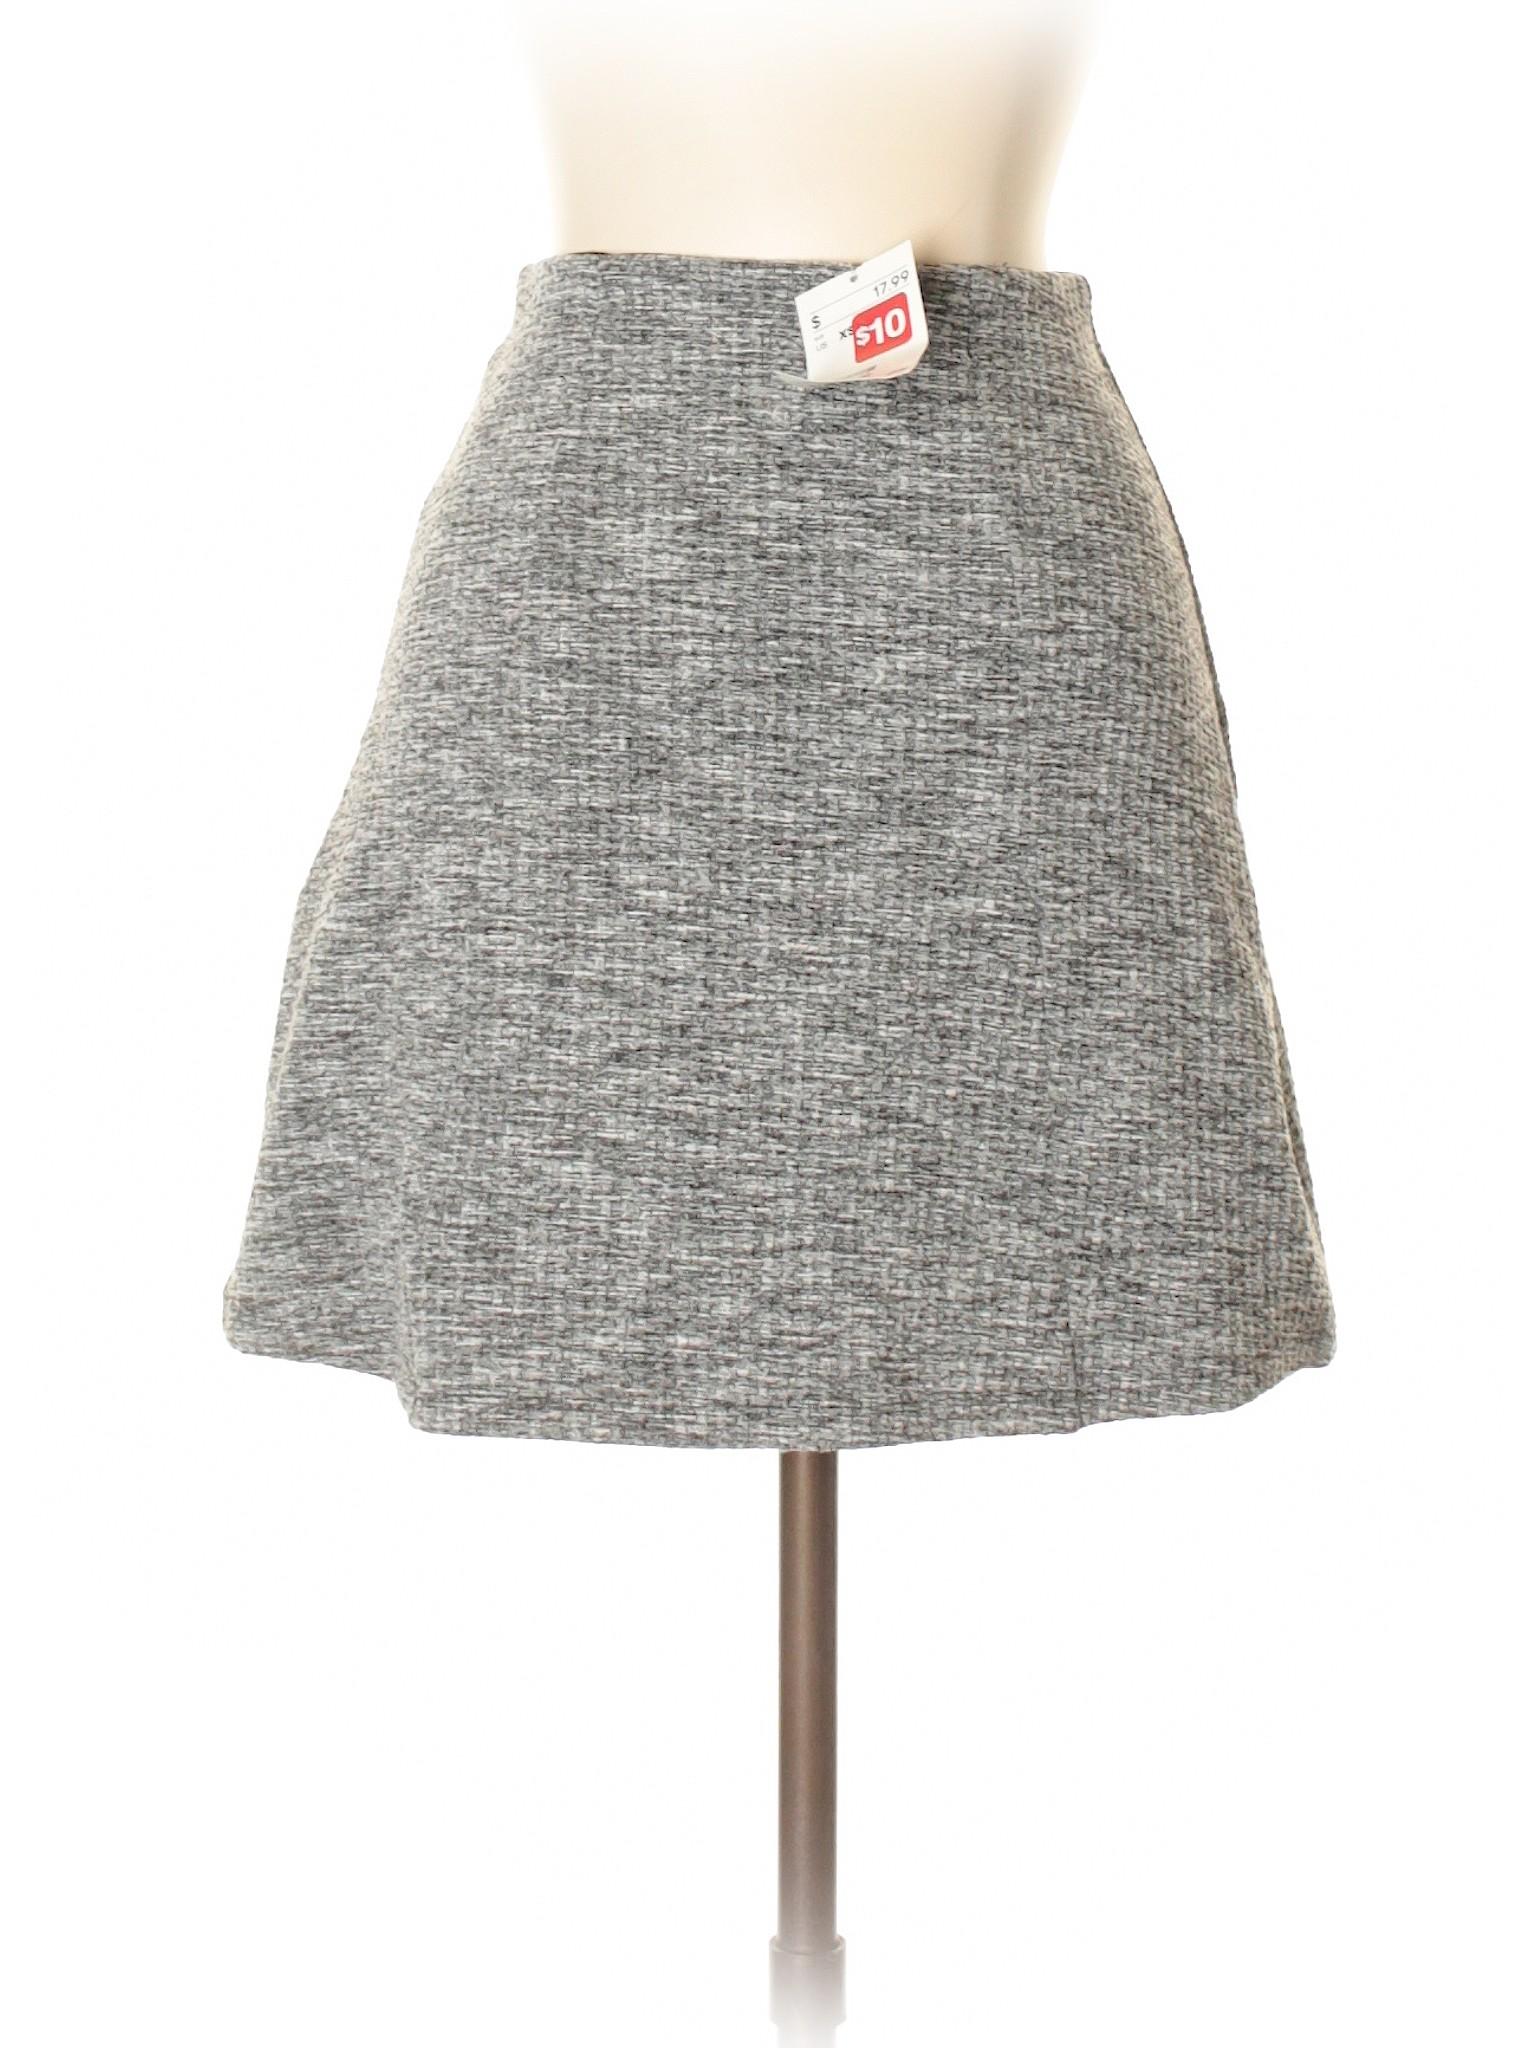 Casual Skirt Boutique Skirt Casual Boutique Boutique 8qnwpEBZ